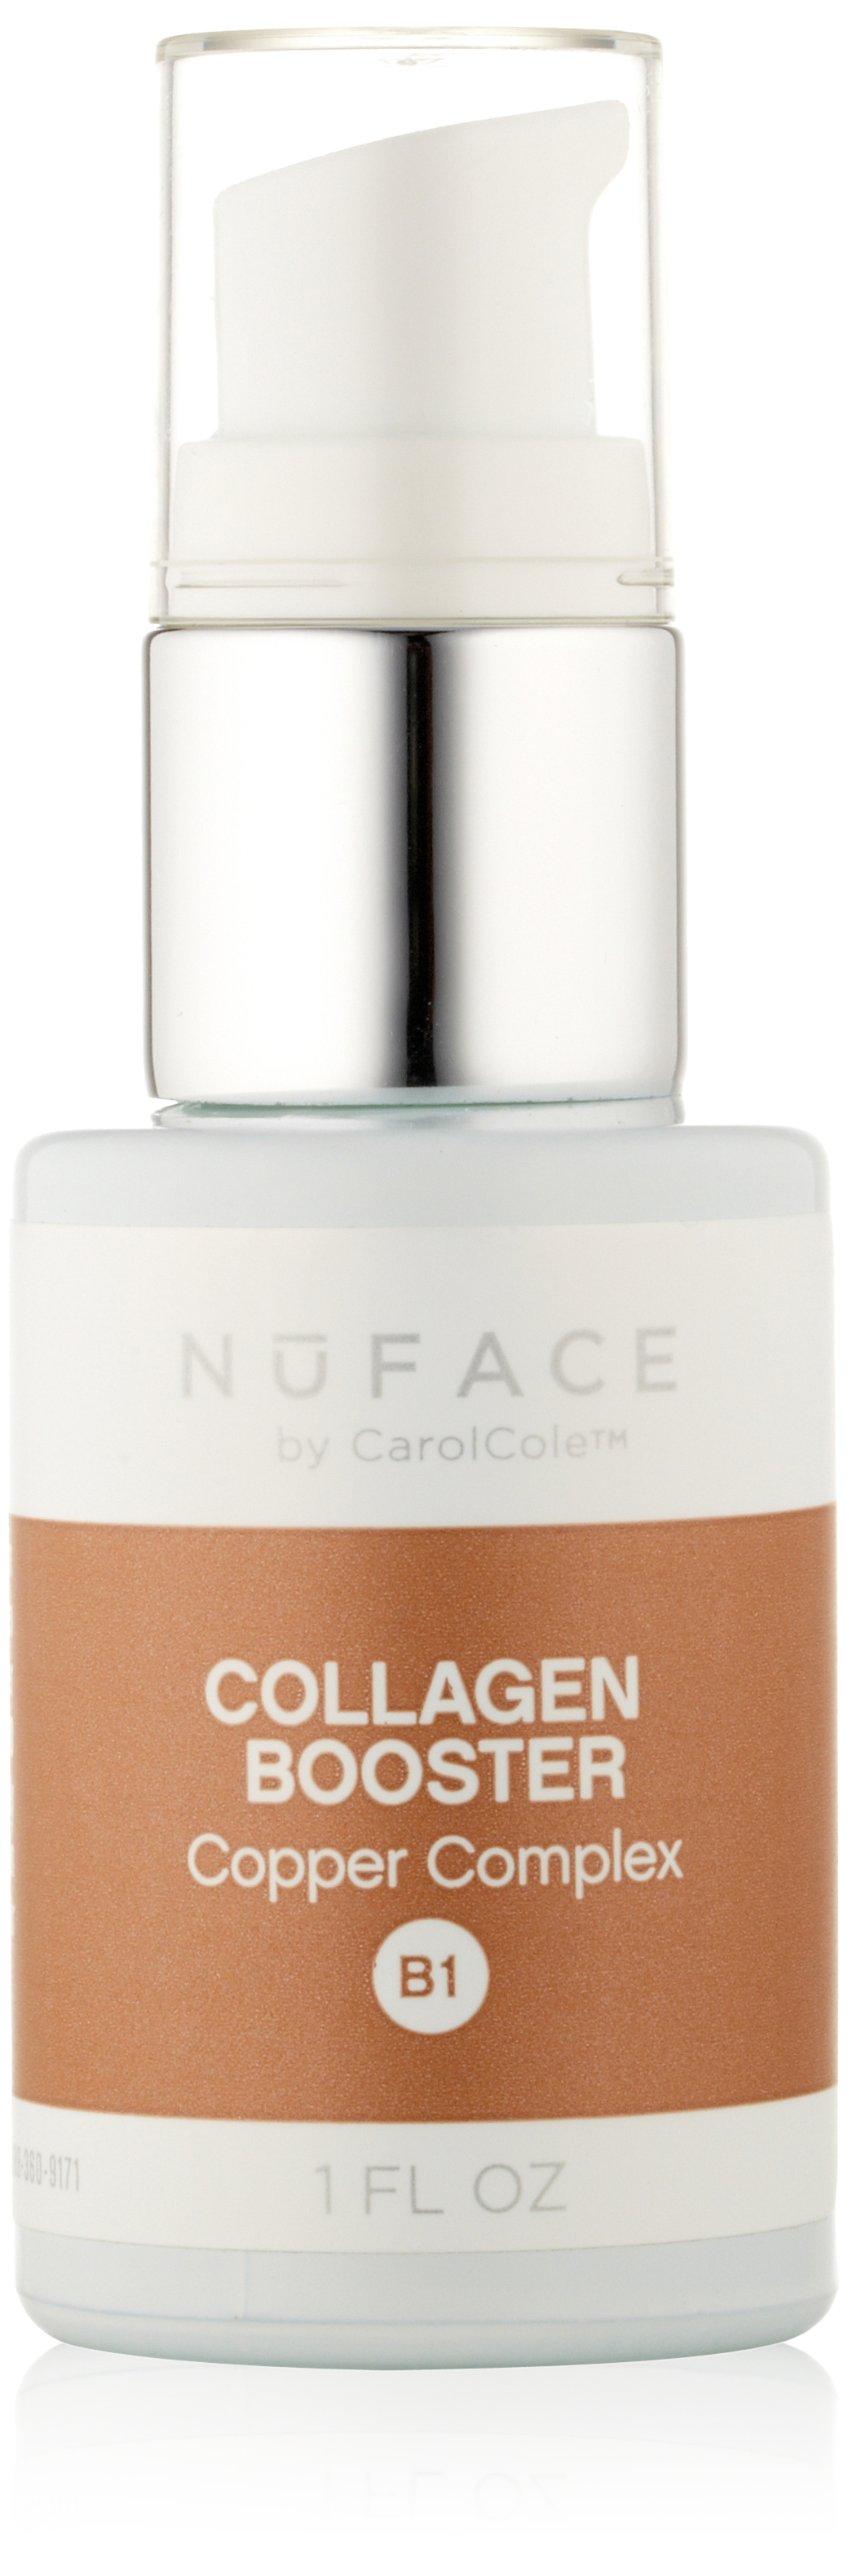 NuFACE Collagen Booster Copper Complex, 1 fl. oz.